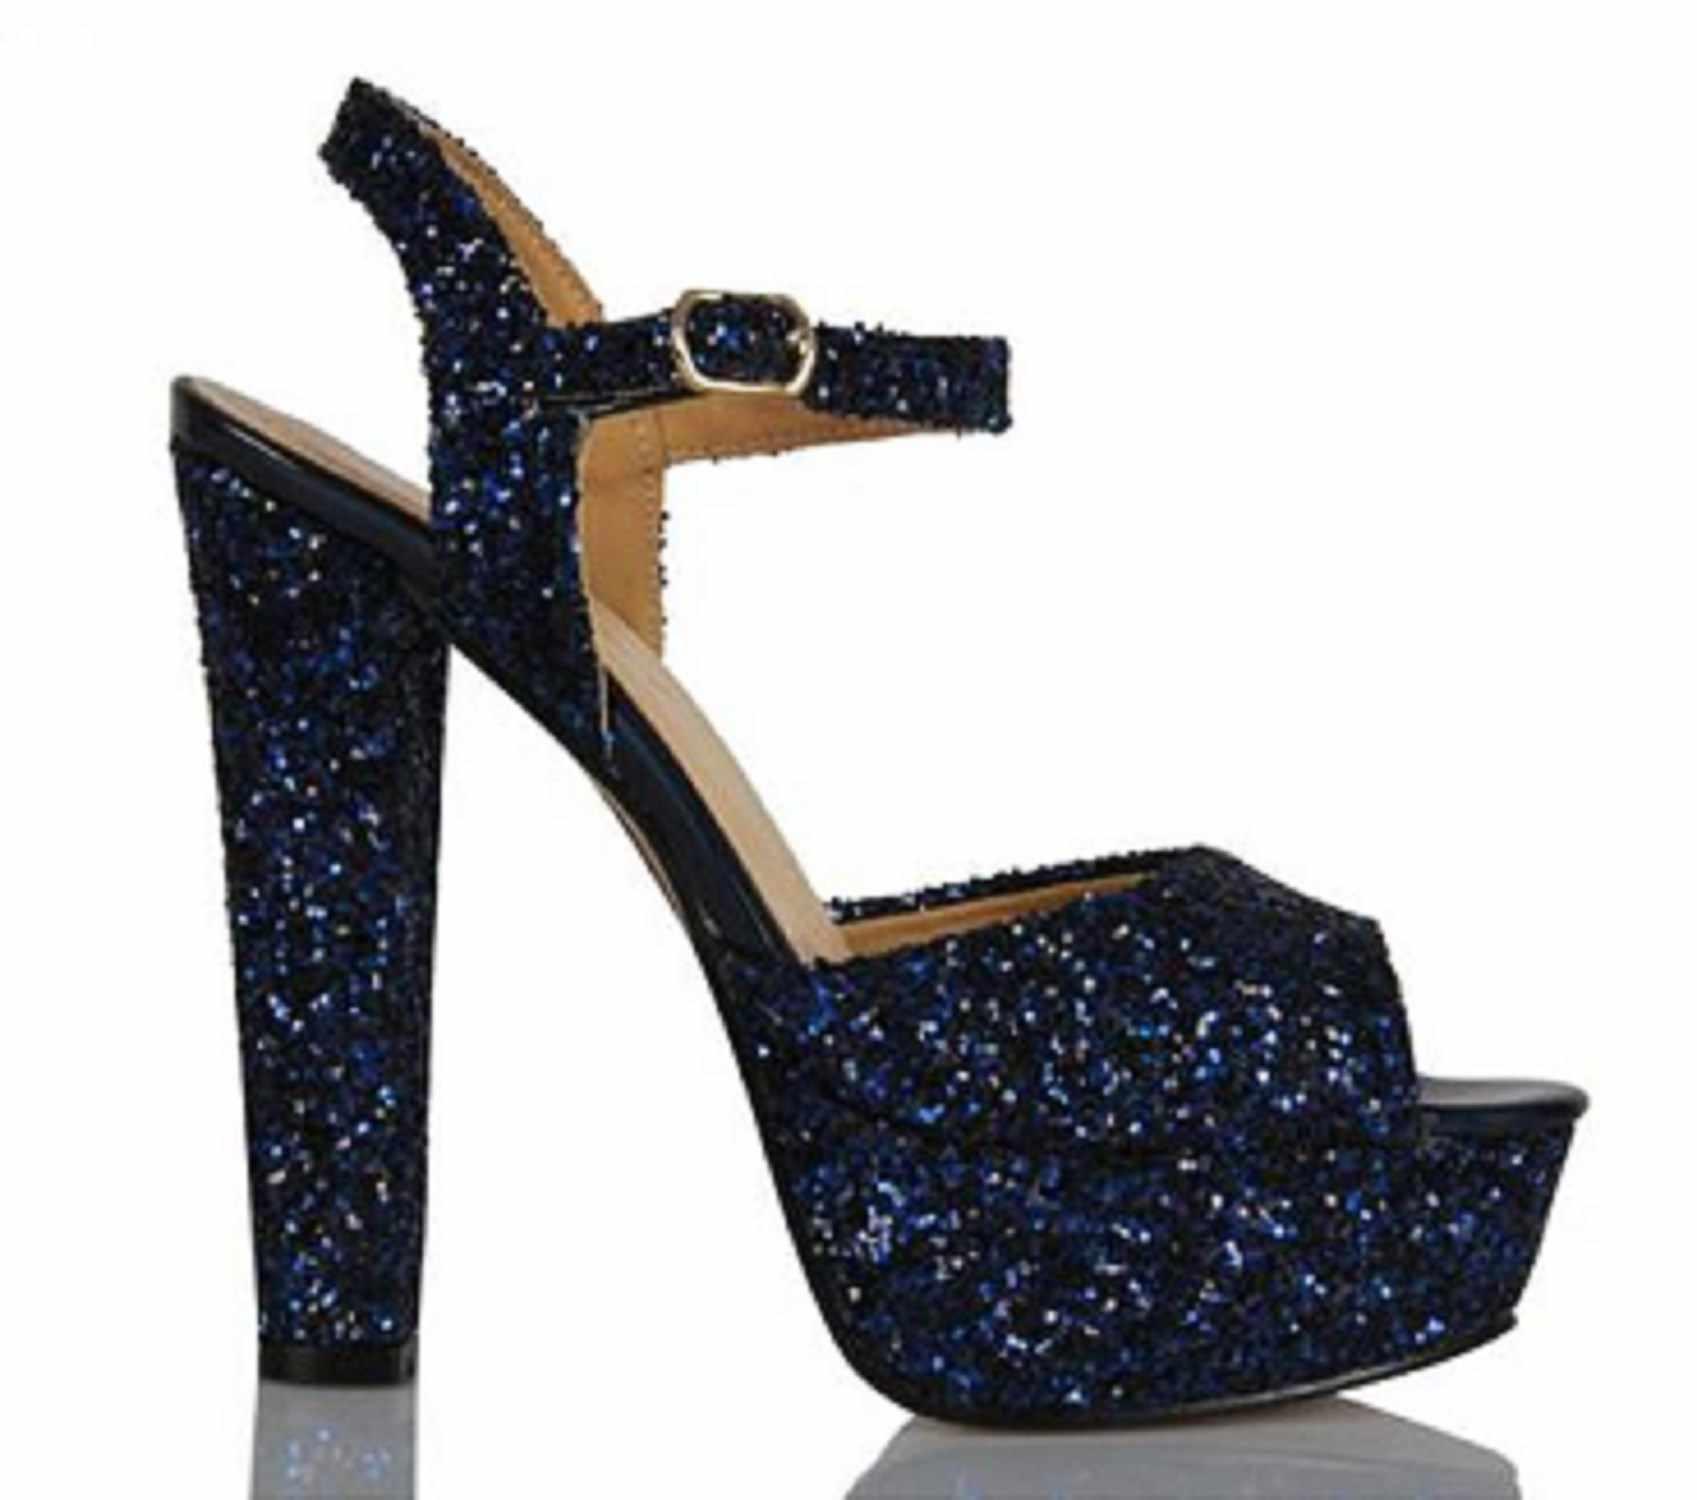 Mst-1027 Navy Blue Glass Fracture ผู้หญิง Elegant ชี้ Toe รองเท้าส้นสูงคริสตัลรองเท้าส้นสูง Slingback 35-40